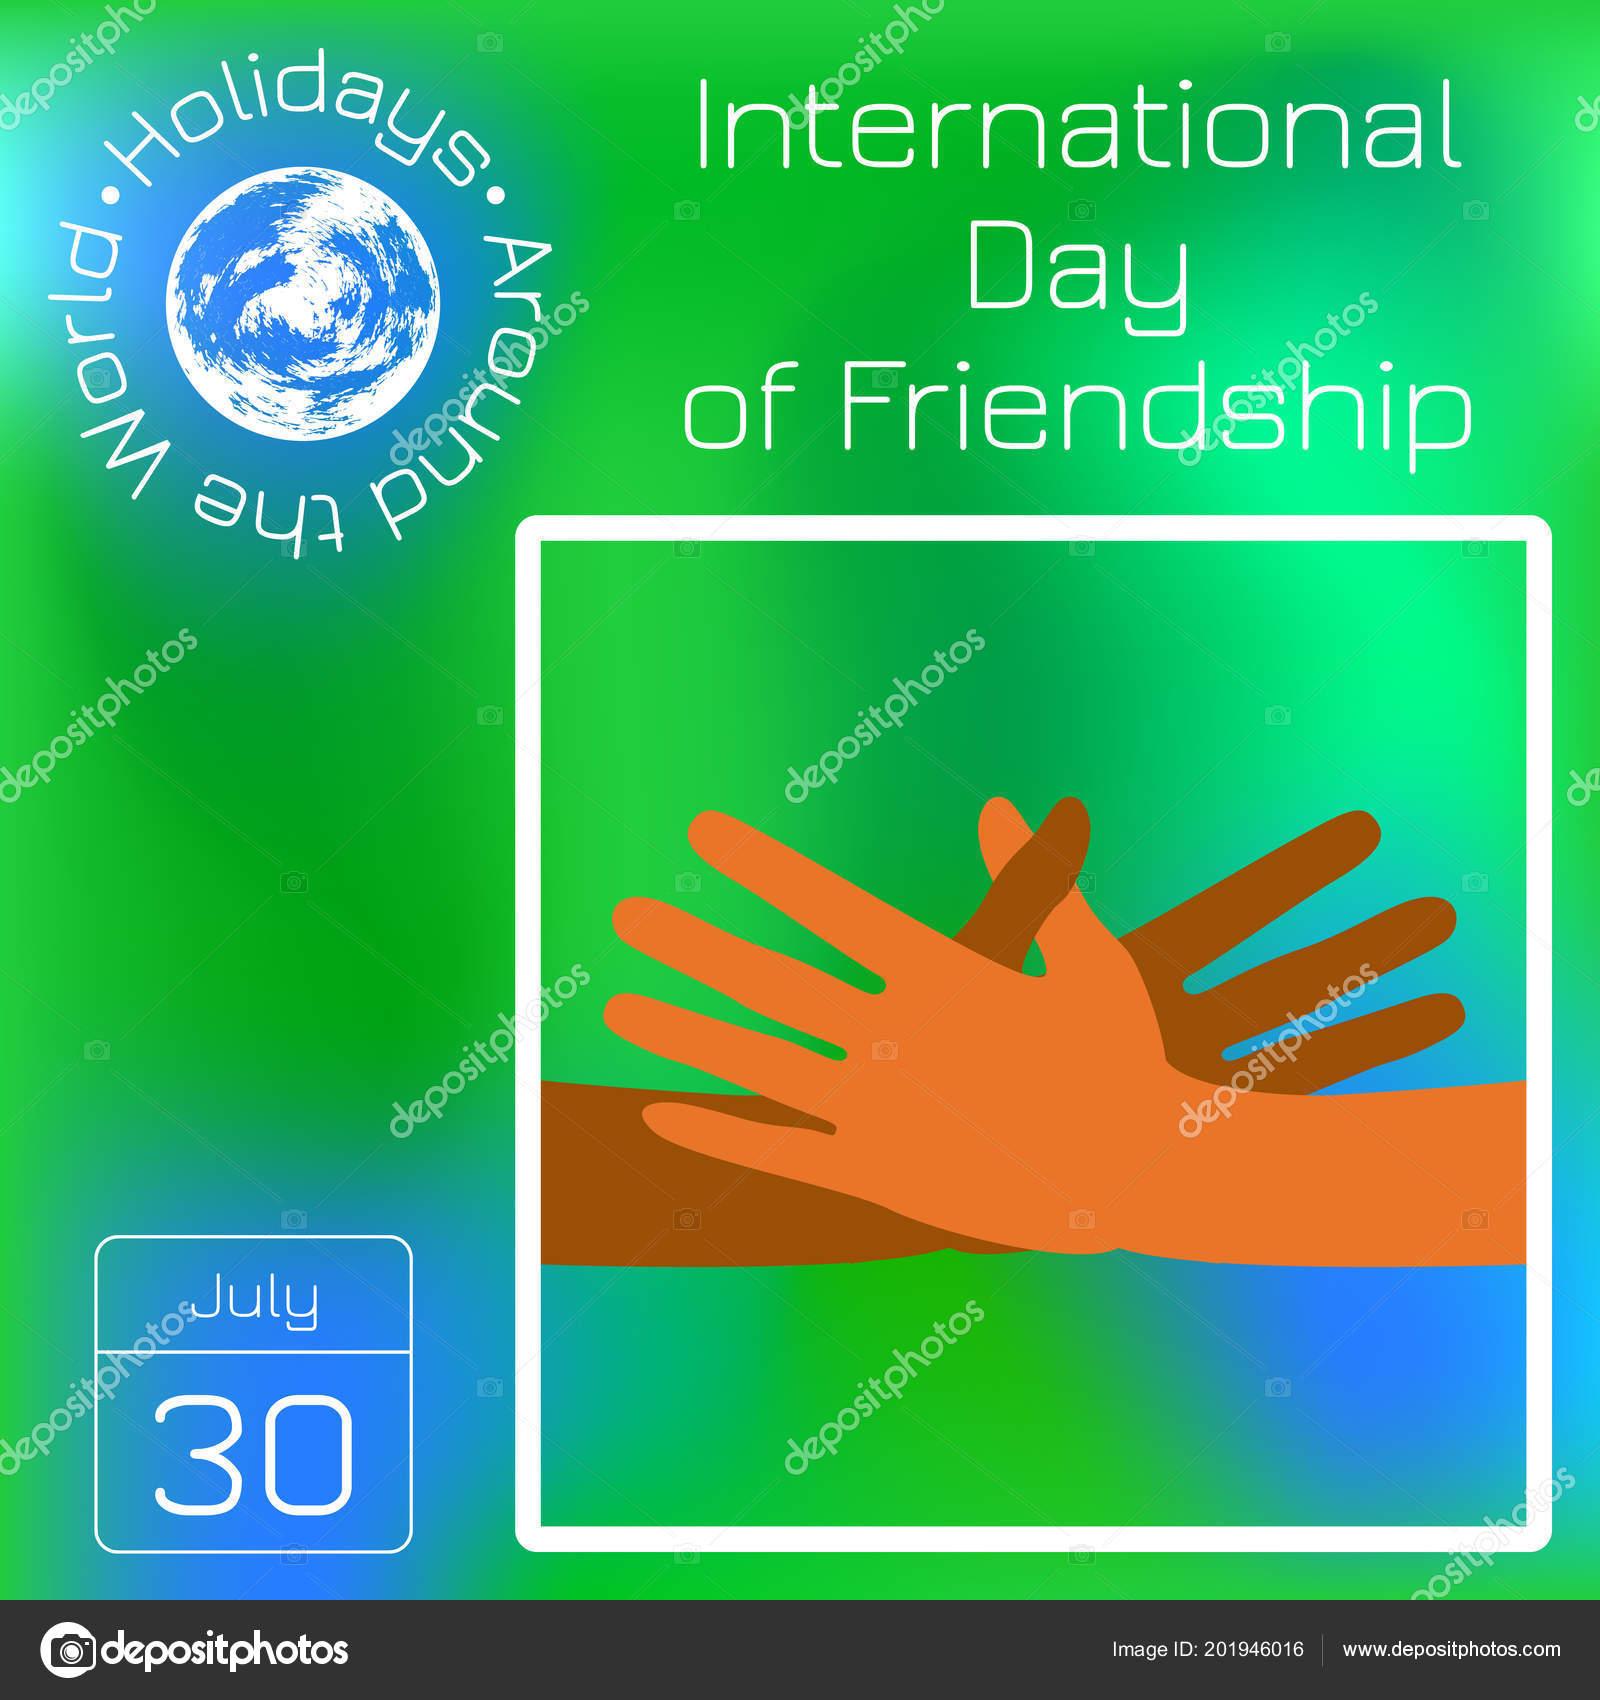 International Day Friendship July Hands People Stretch Make